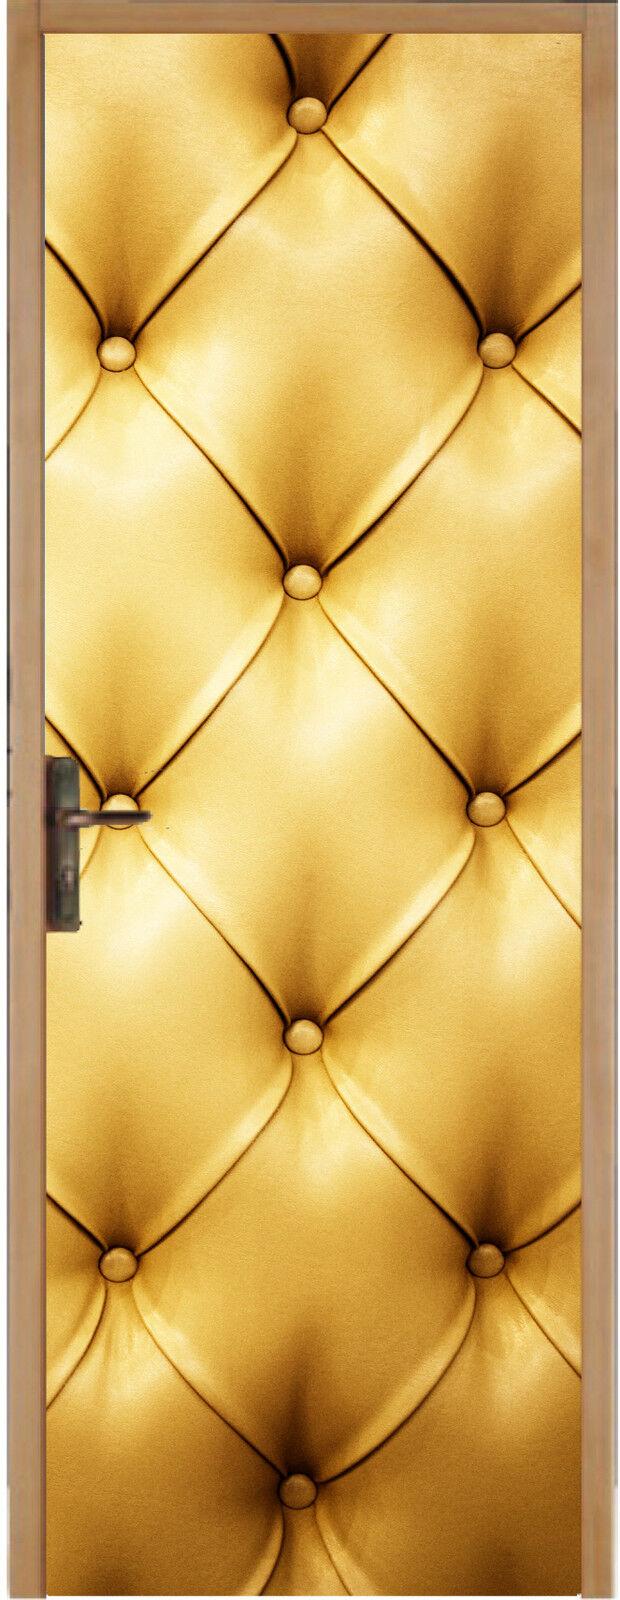 Adhesivo para Puerta Plana Capitoné oro 83x204cm Ref 312